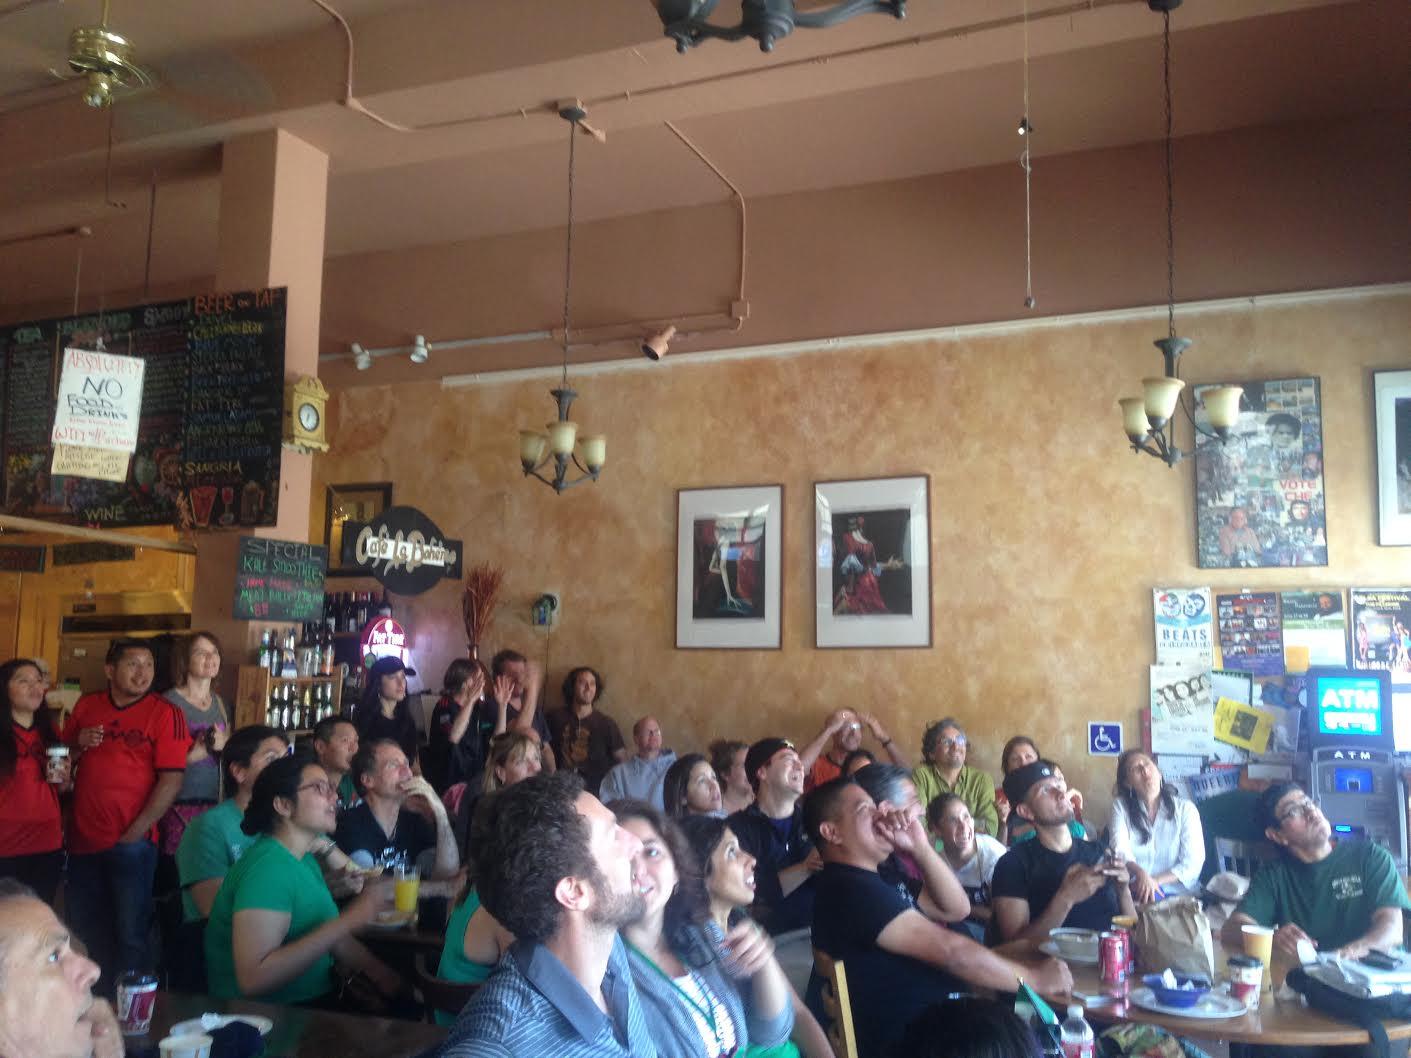 World Cup fans at La Boheme. Photo by Cristina Abellan-Matamoros.